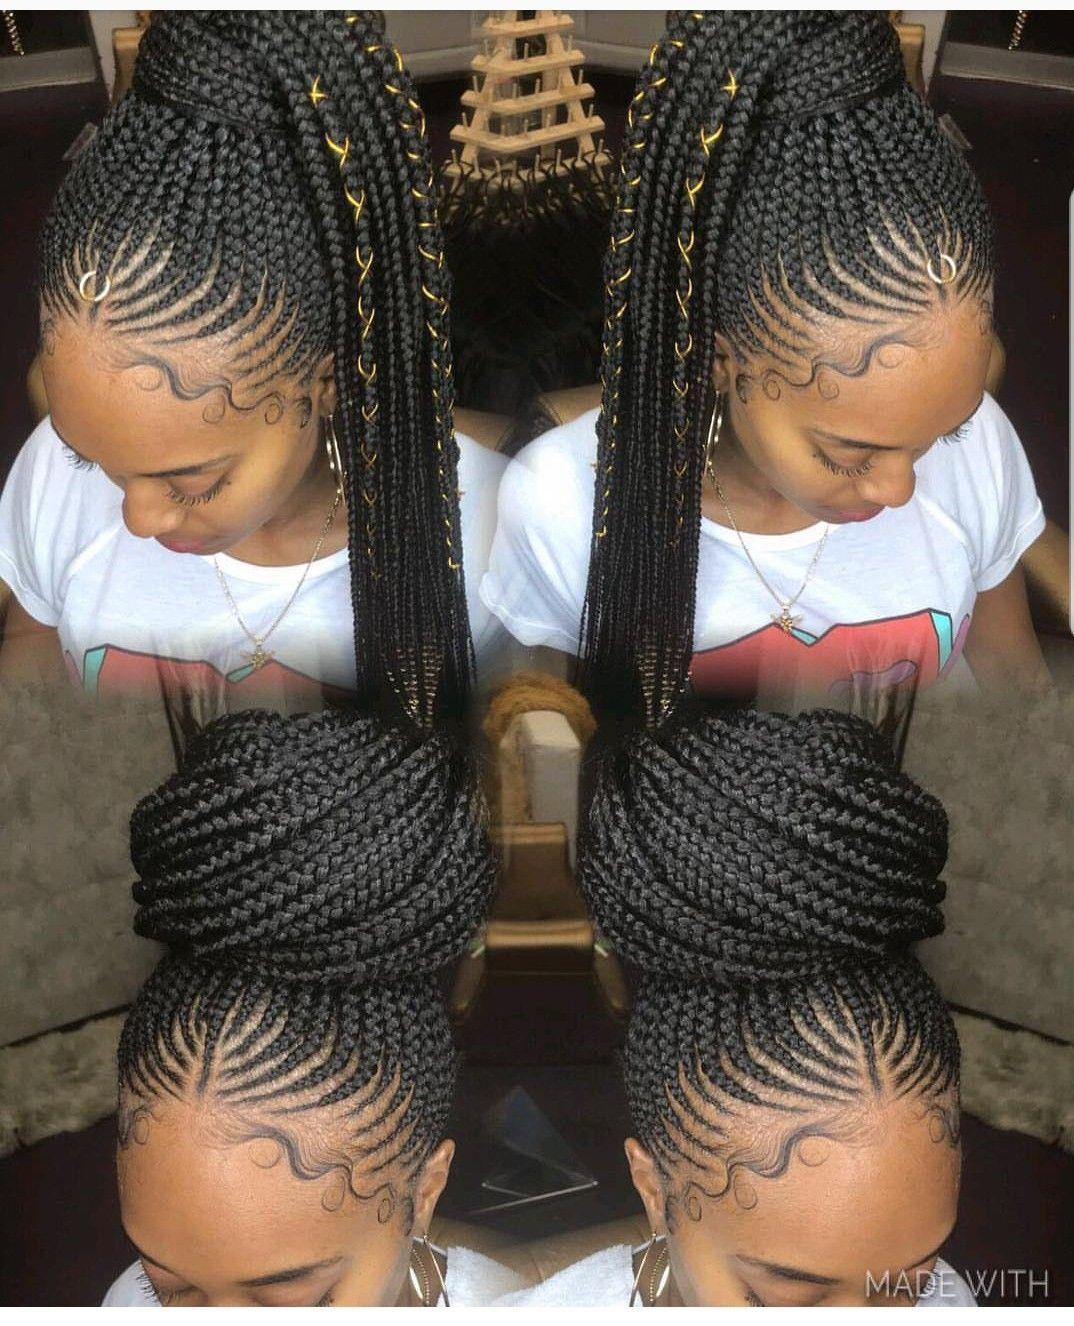 Blackhairstyles Braided Cornrow Hairstyles Cornrow Hairstyles Hair Styles